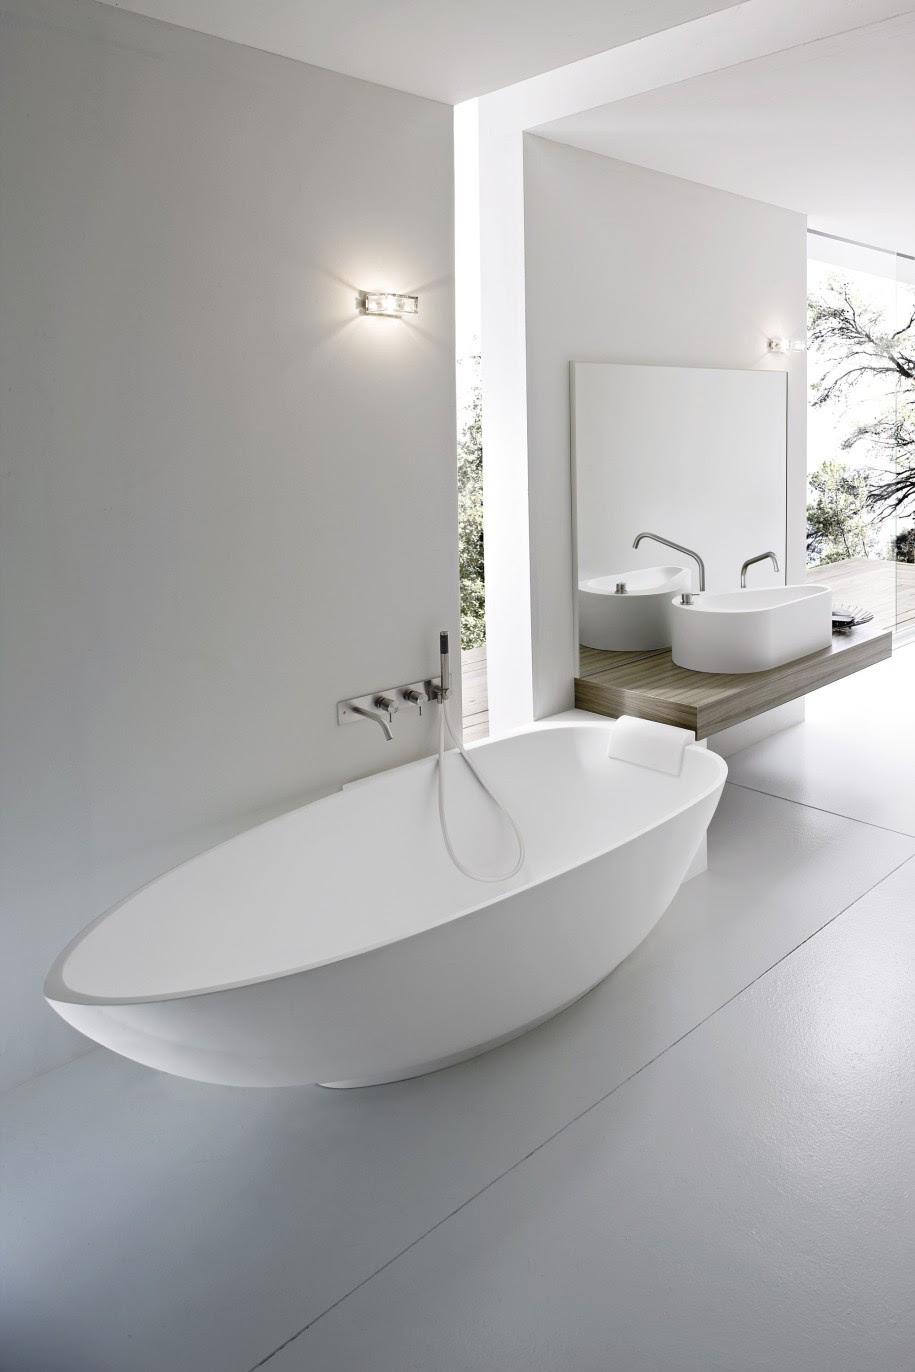 30 Bathtubs Designs Ideas To Make Your Bathroom Luxurious ...